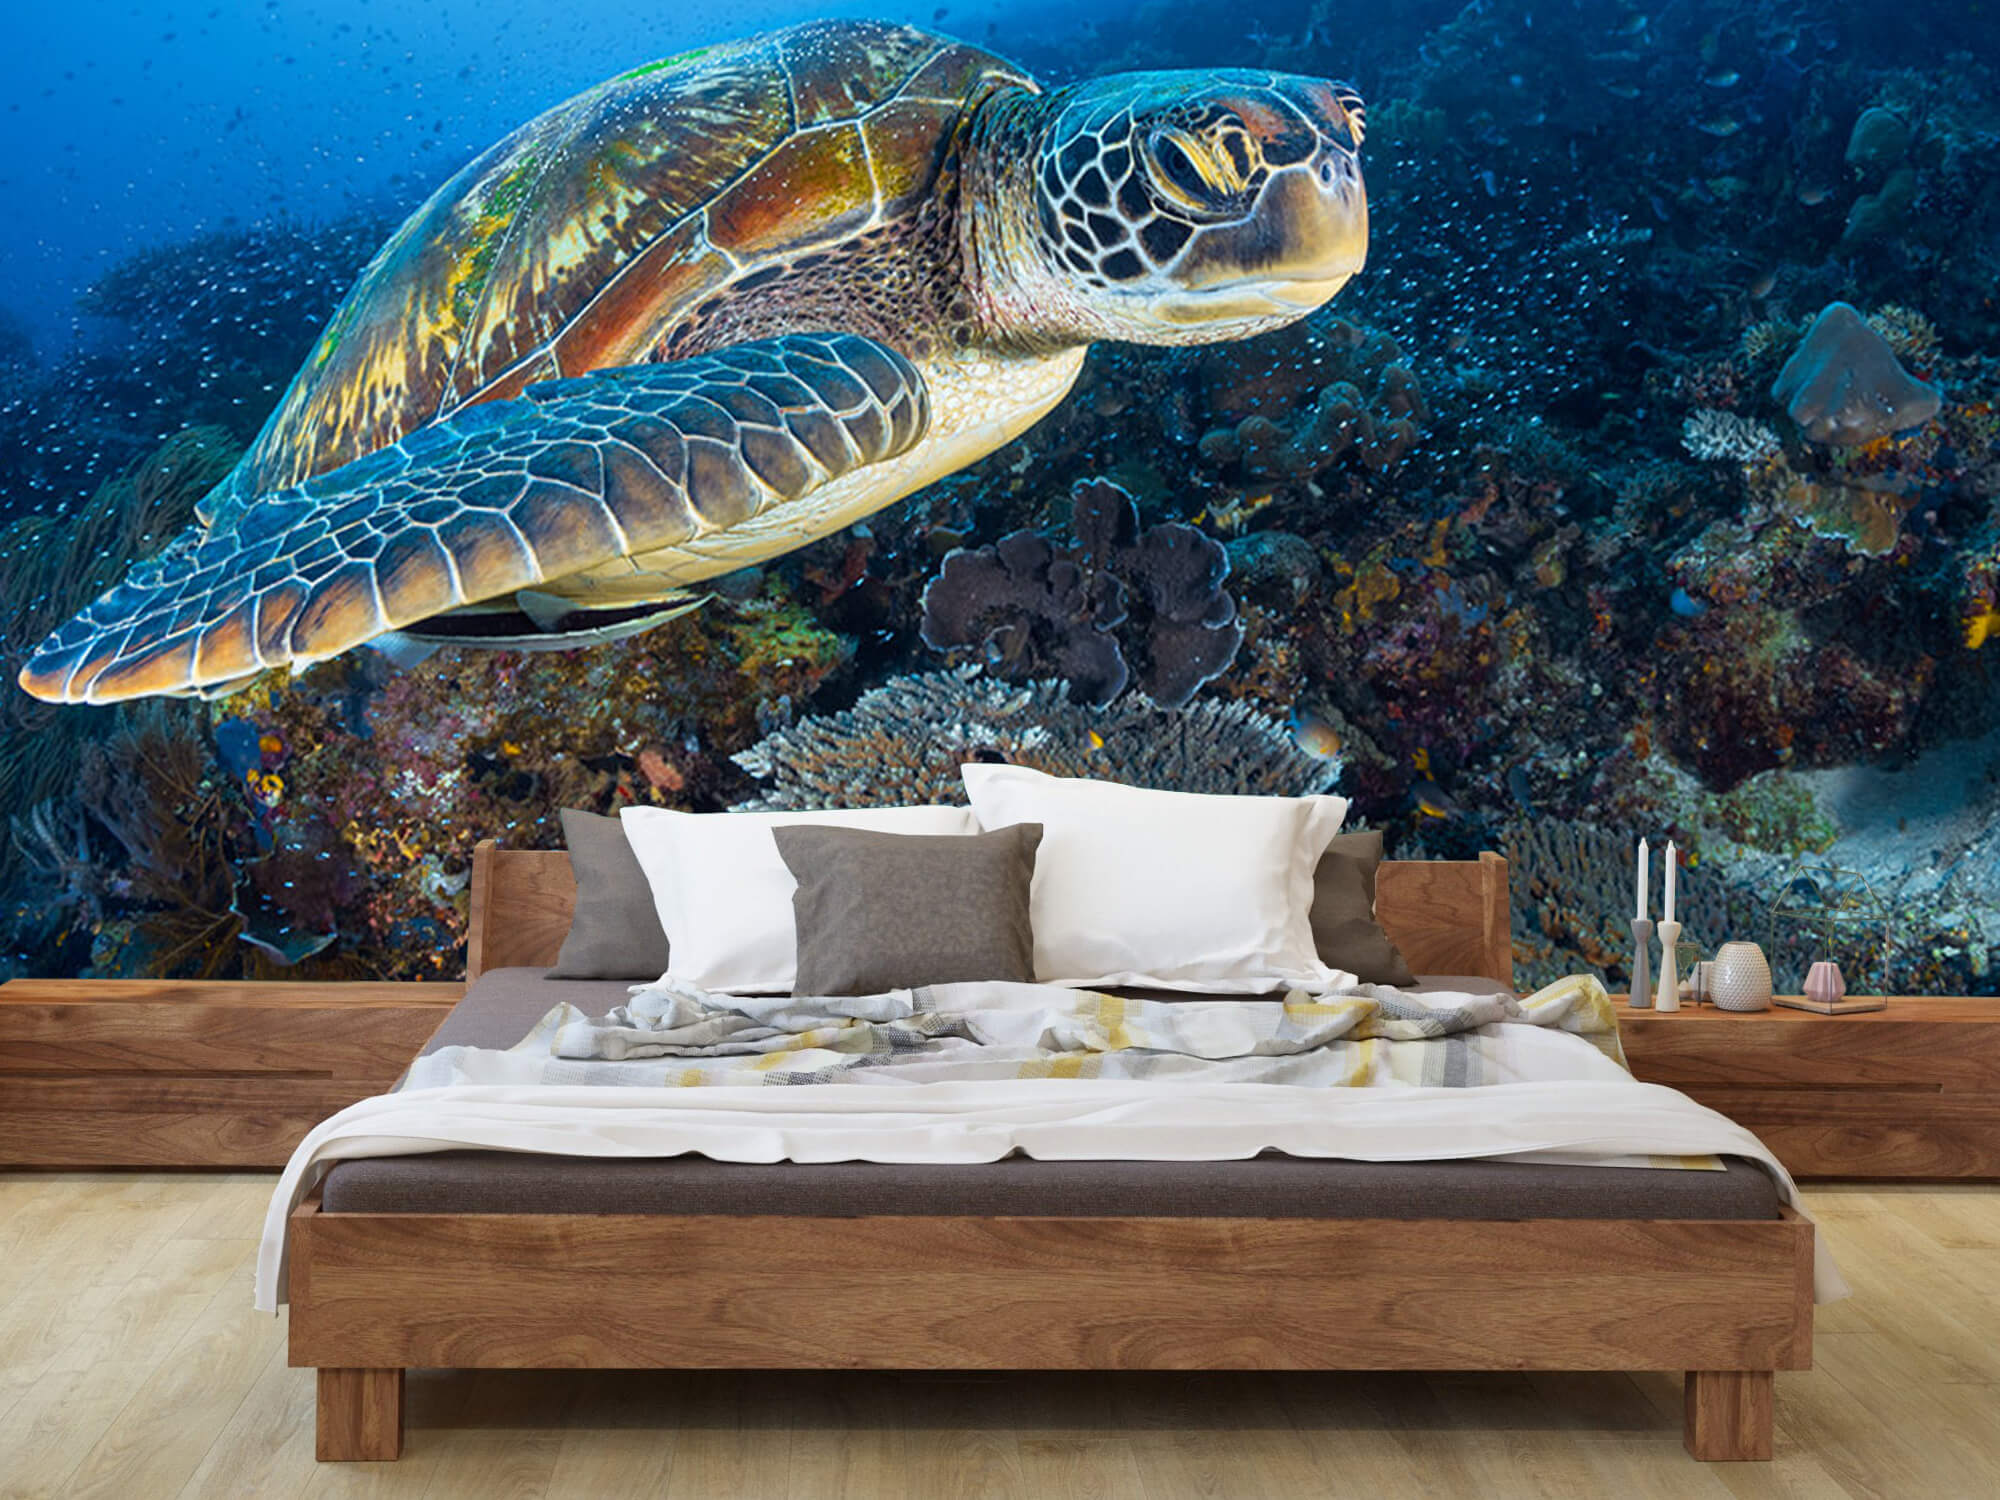 Green sea turtle from Raja Ampat 5